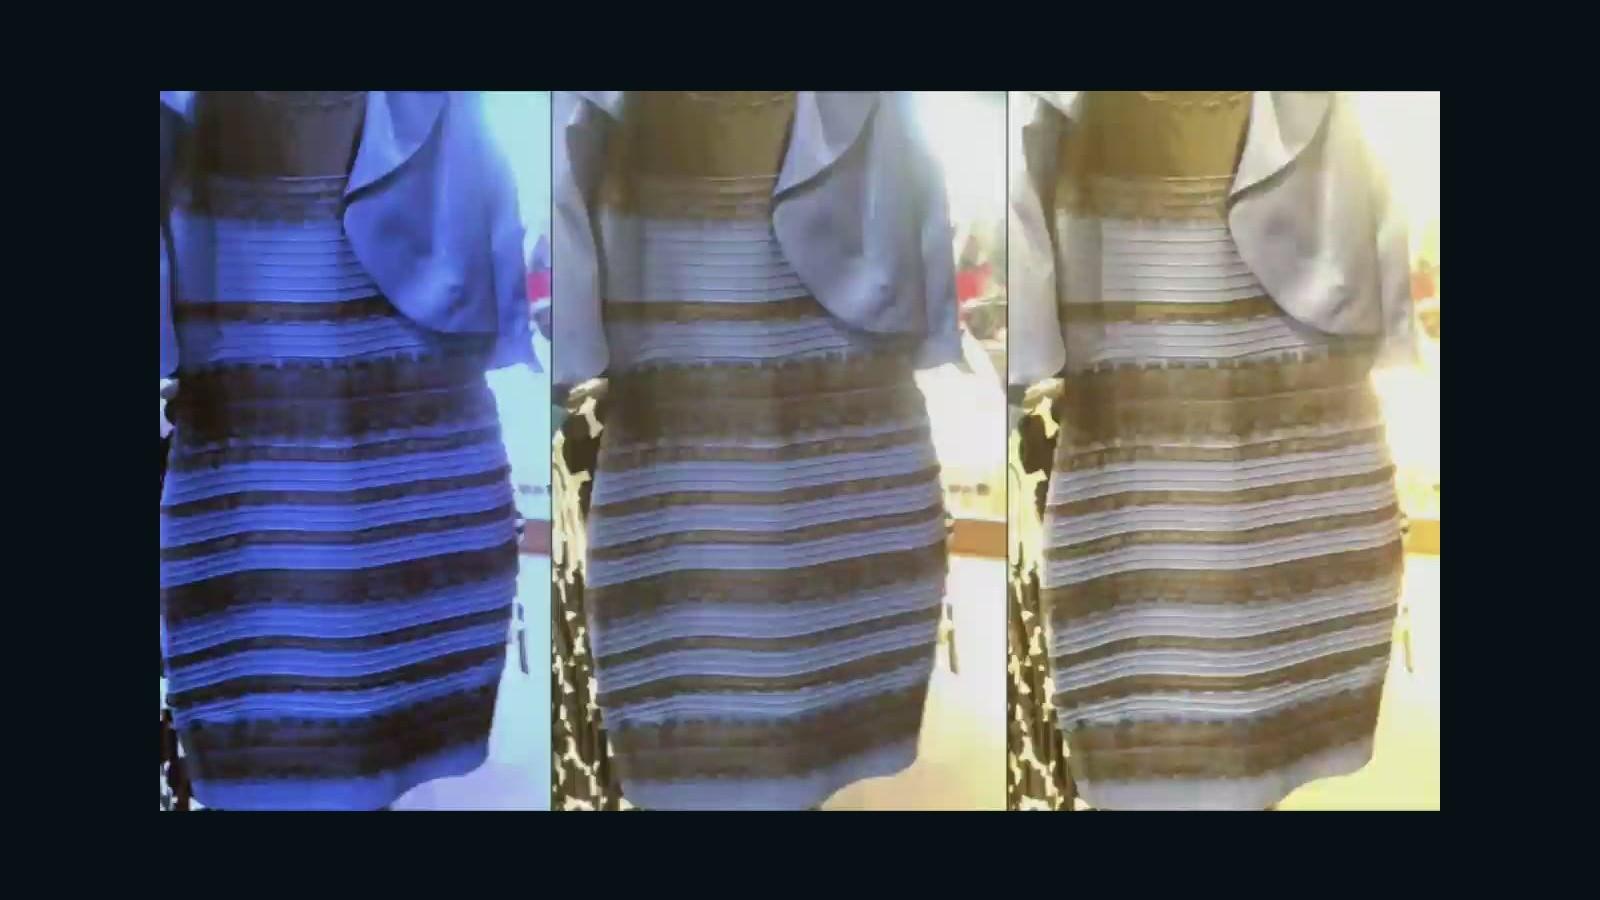 The dress debate color - The Dress Debate Color 17